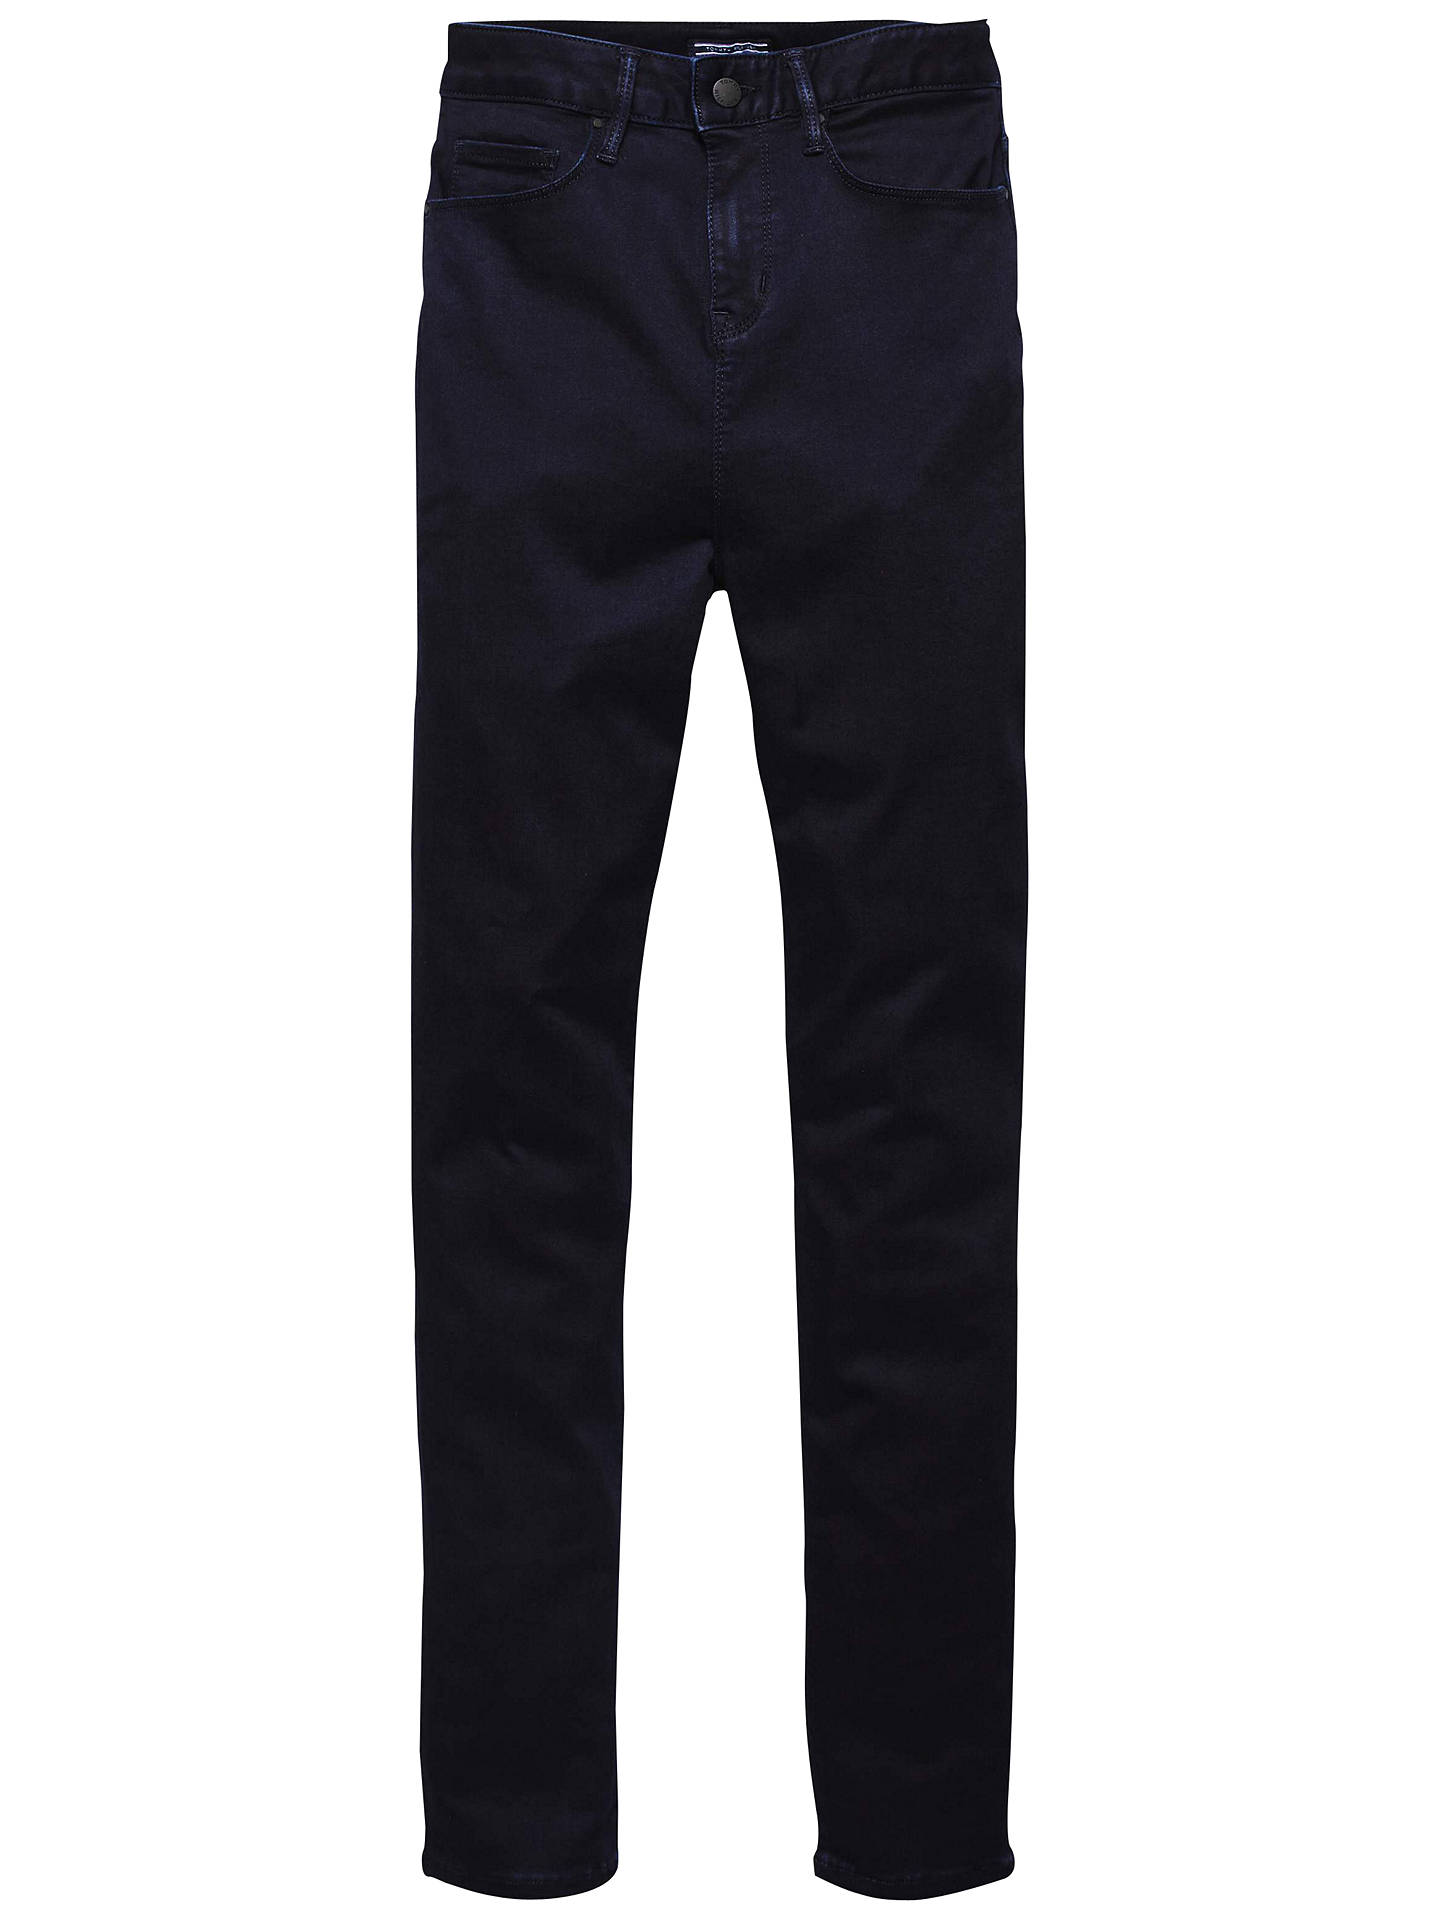 f92189339 Buy Tommy Hilfiger Super High Waist Skinny Jeans, Fiona, 26 Online at  johnlewis.